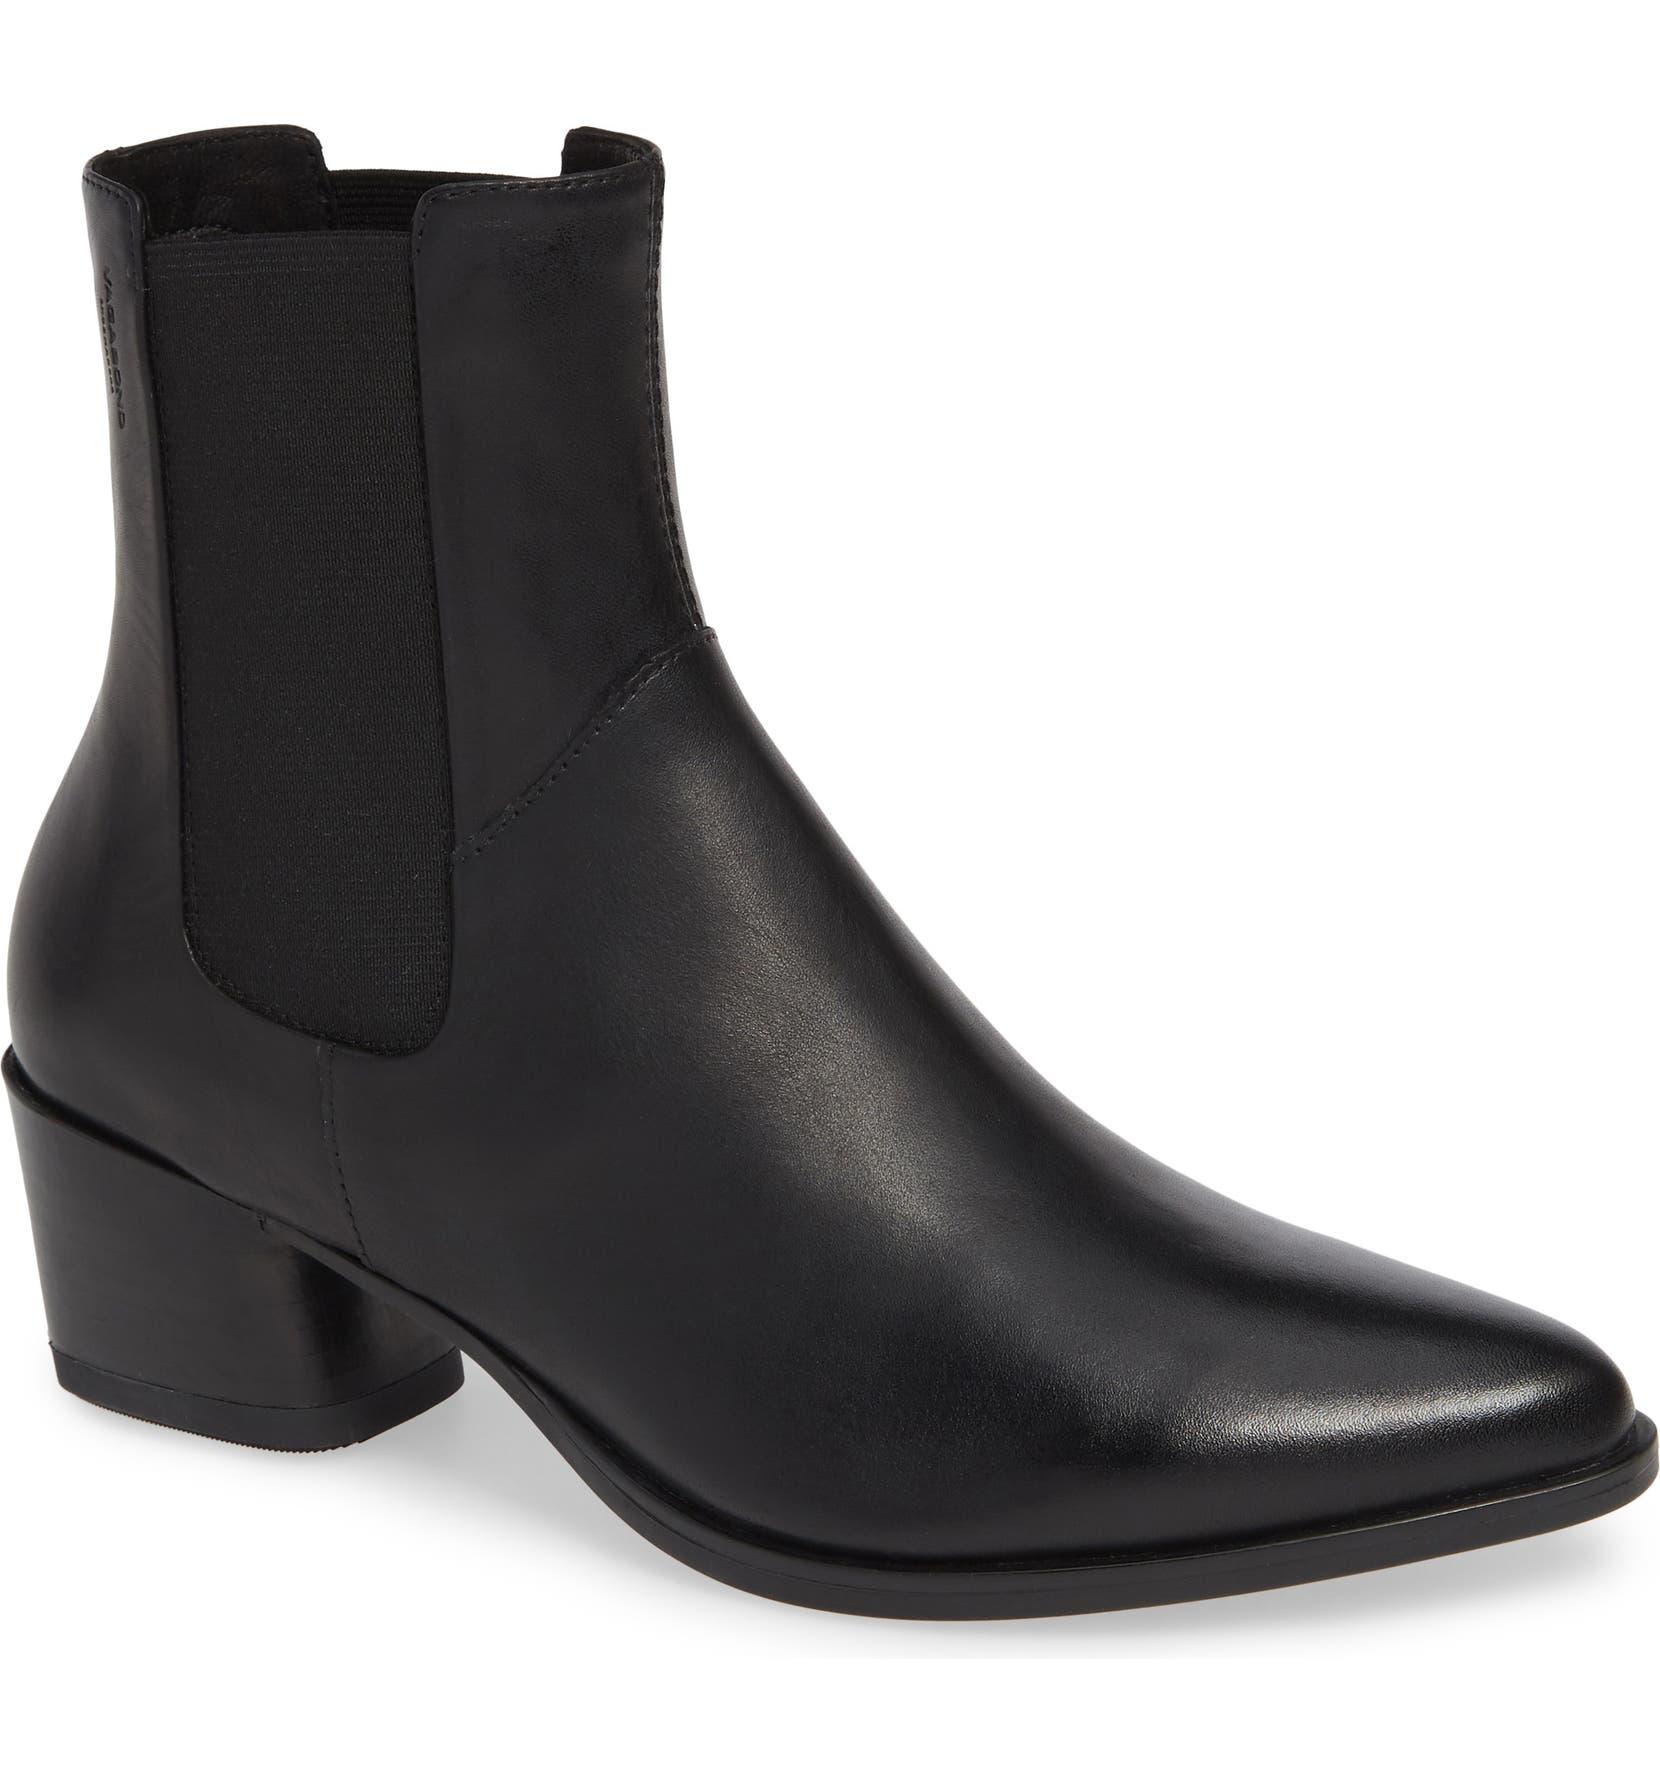 0f62458ec67c70 Vagabond Shoemakers Lara Bootie (Women)